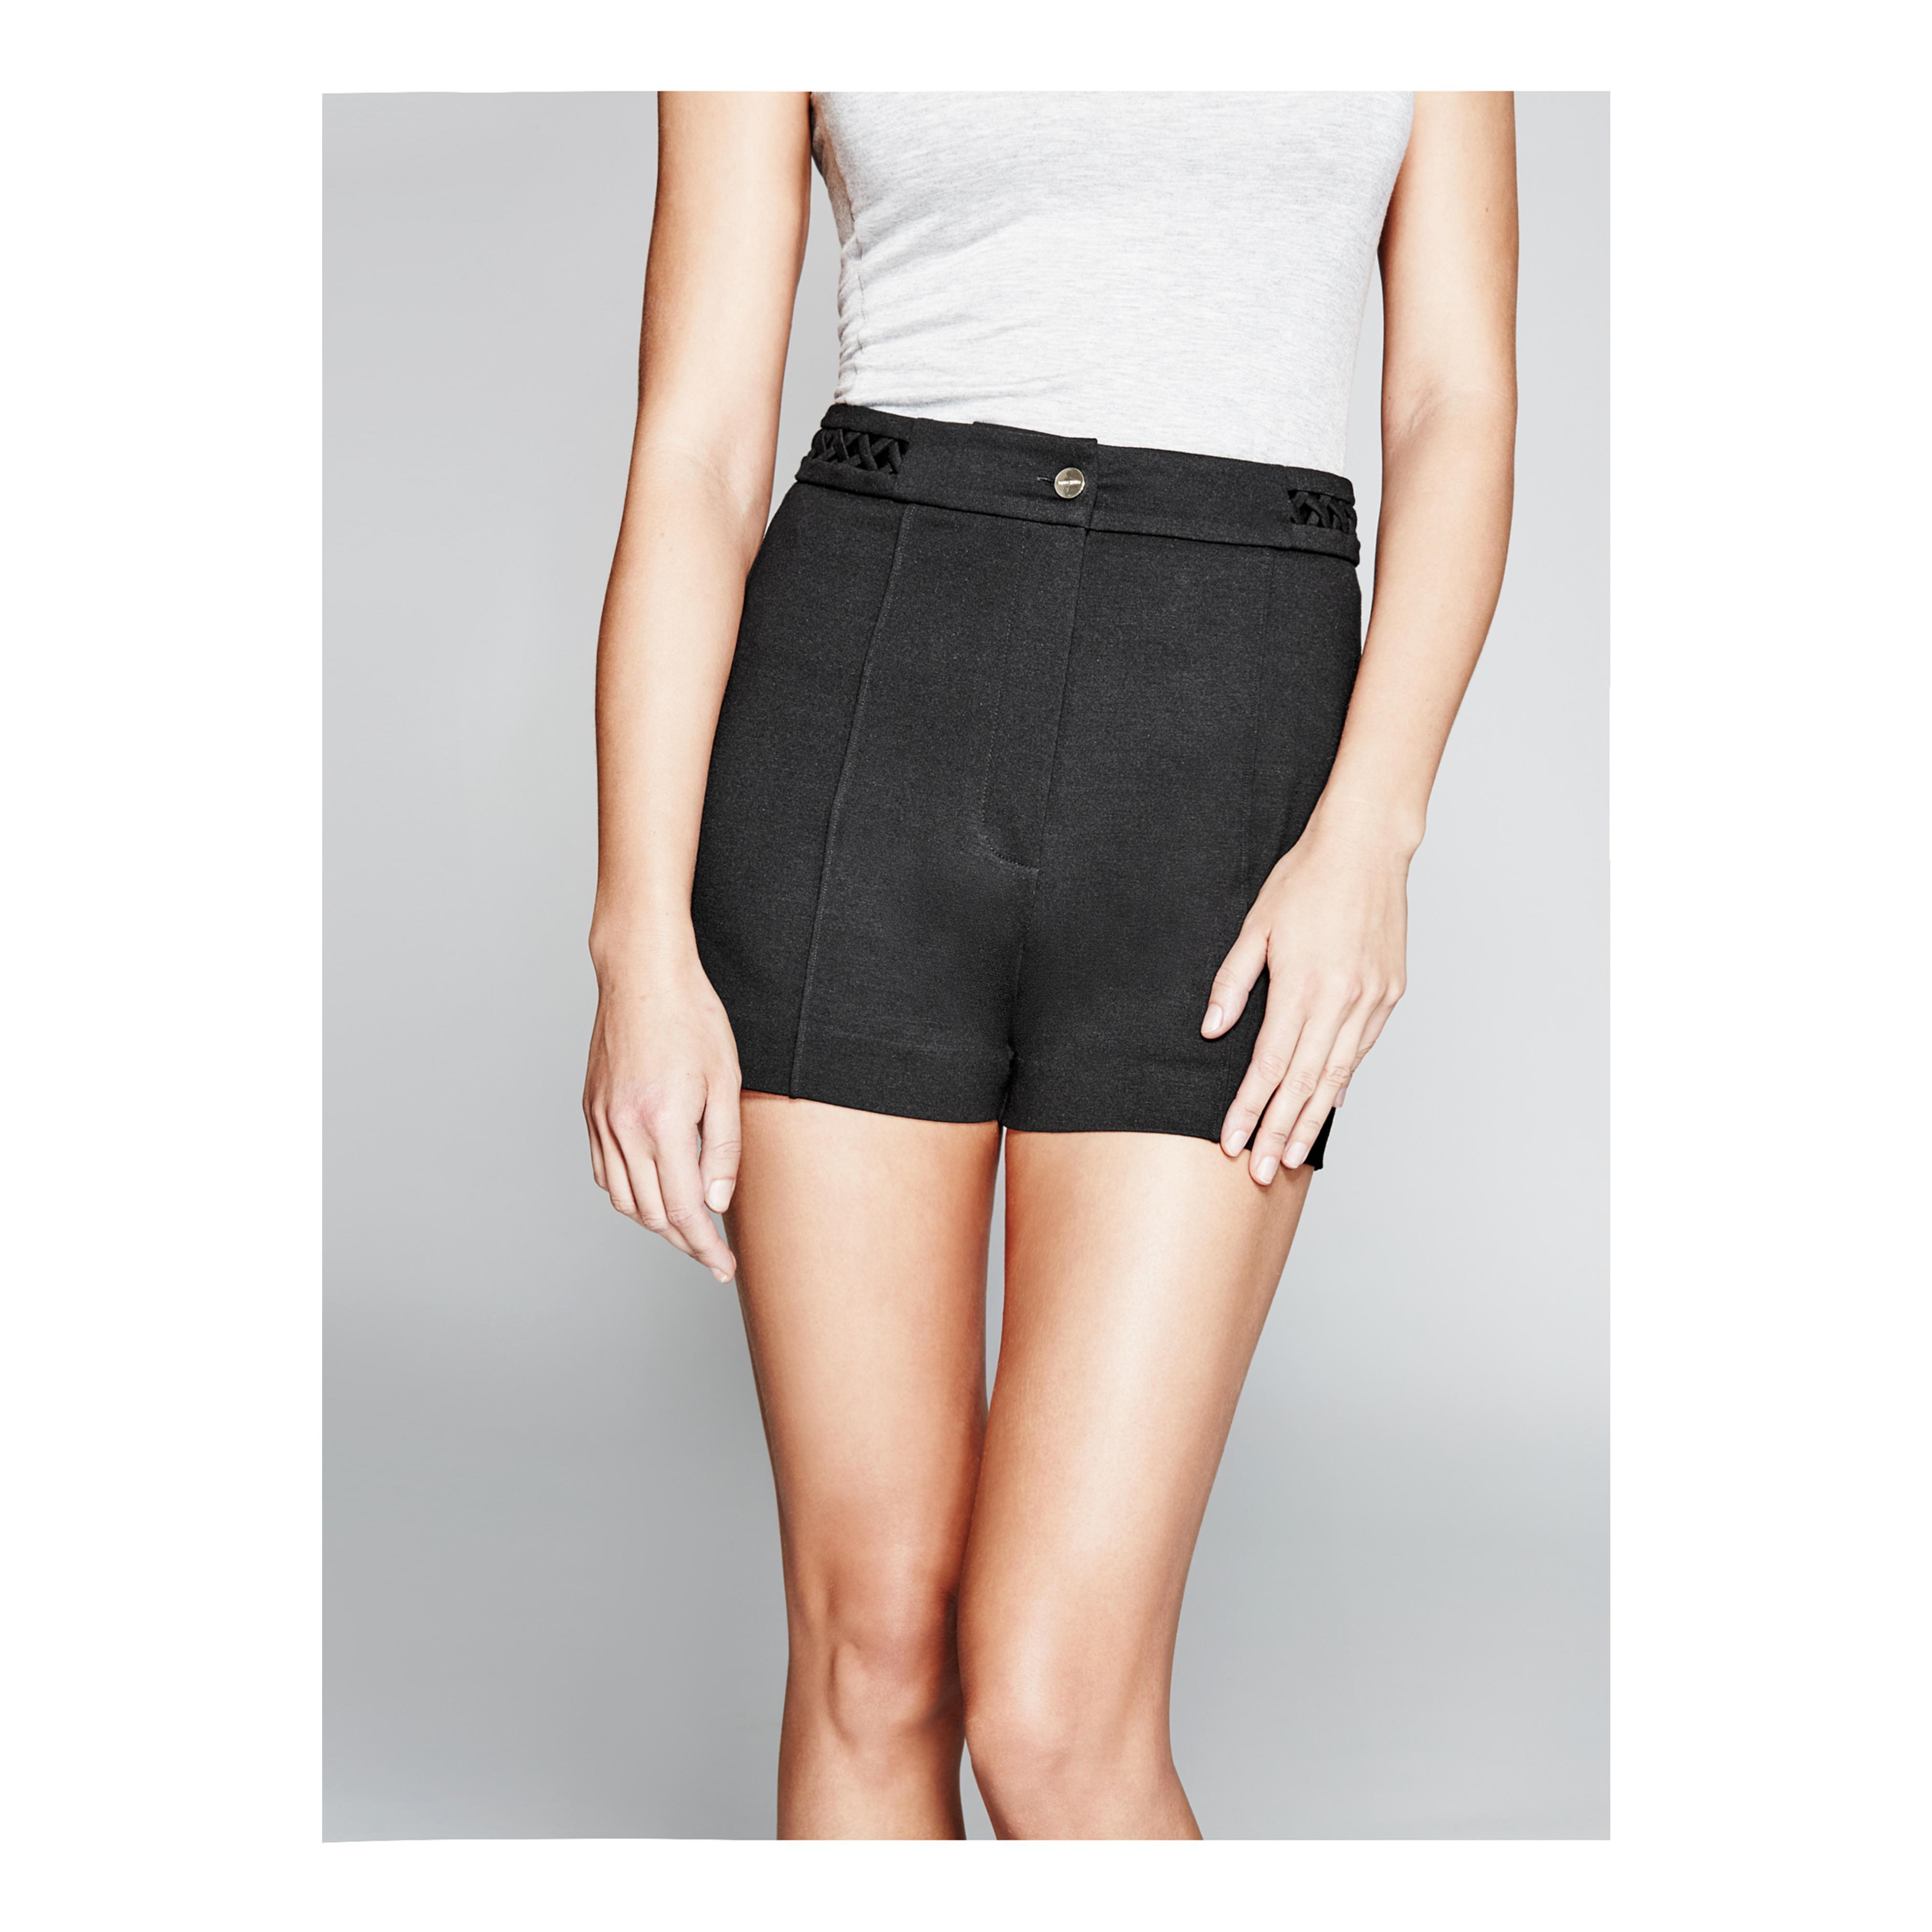 ae7890f3870 Lyst - Guess Mariella Ponte Short in Black